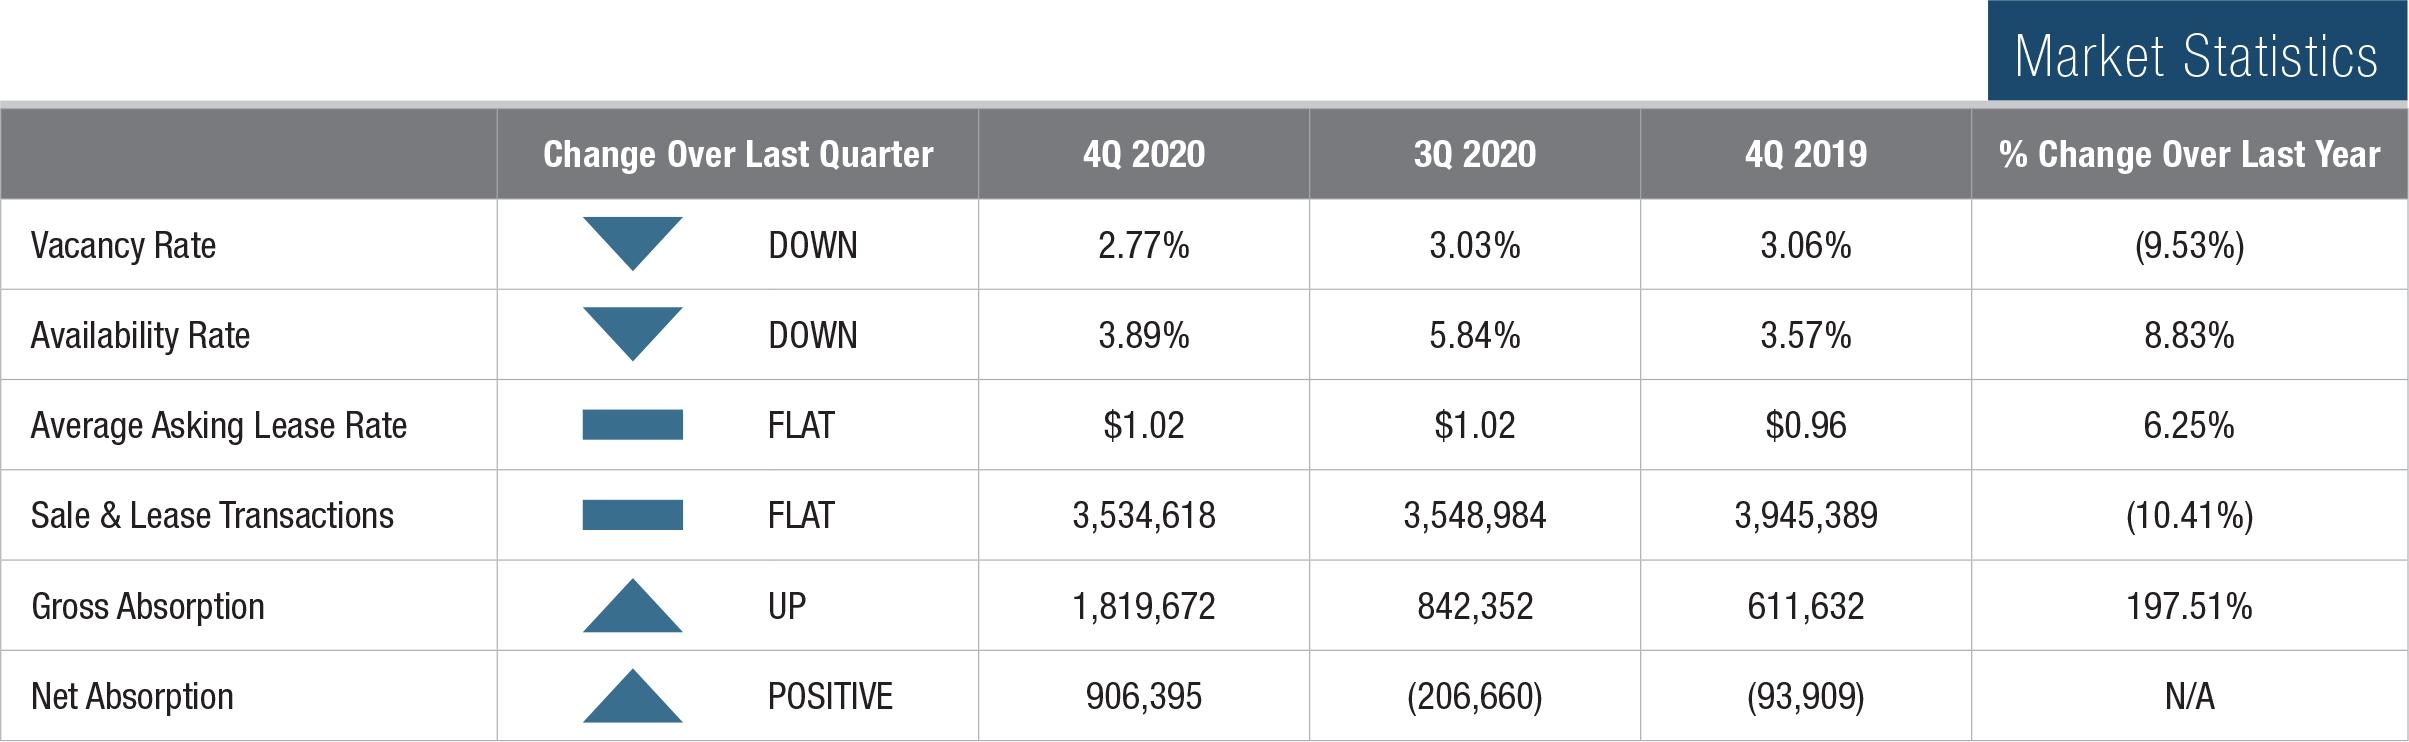 4Q 2020 Market Statistics